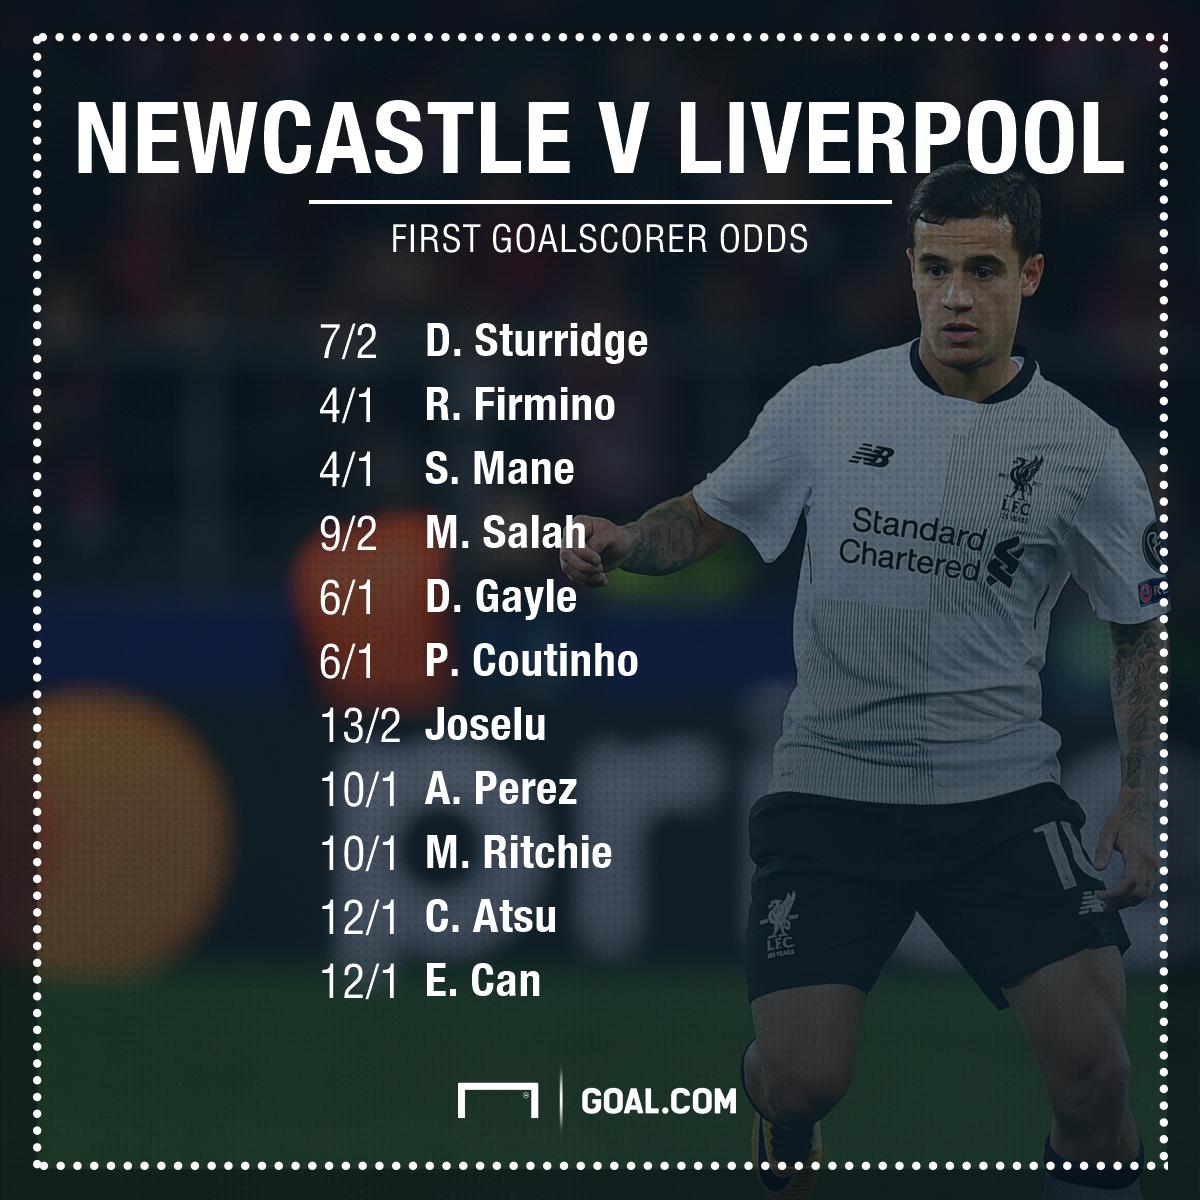 Newcastle v Liverpool betting